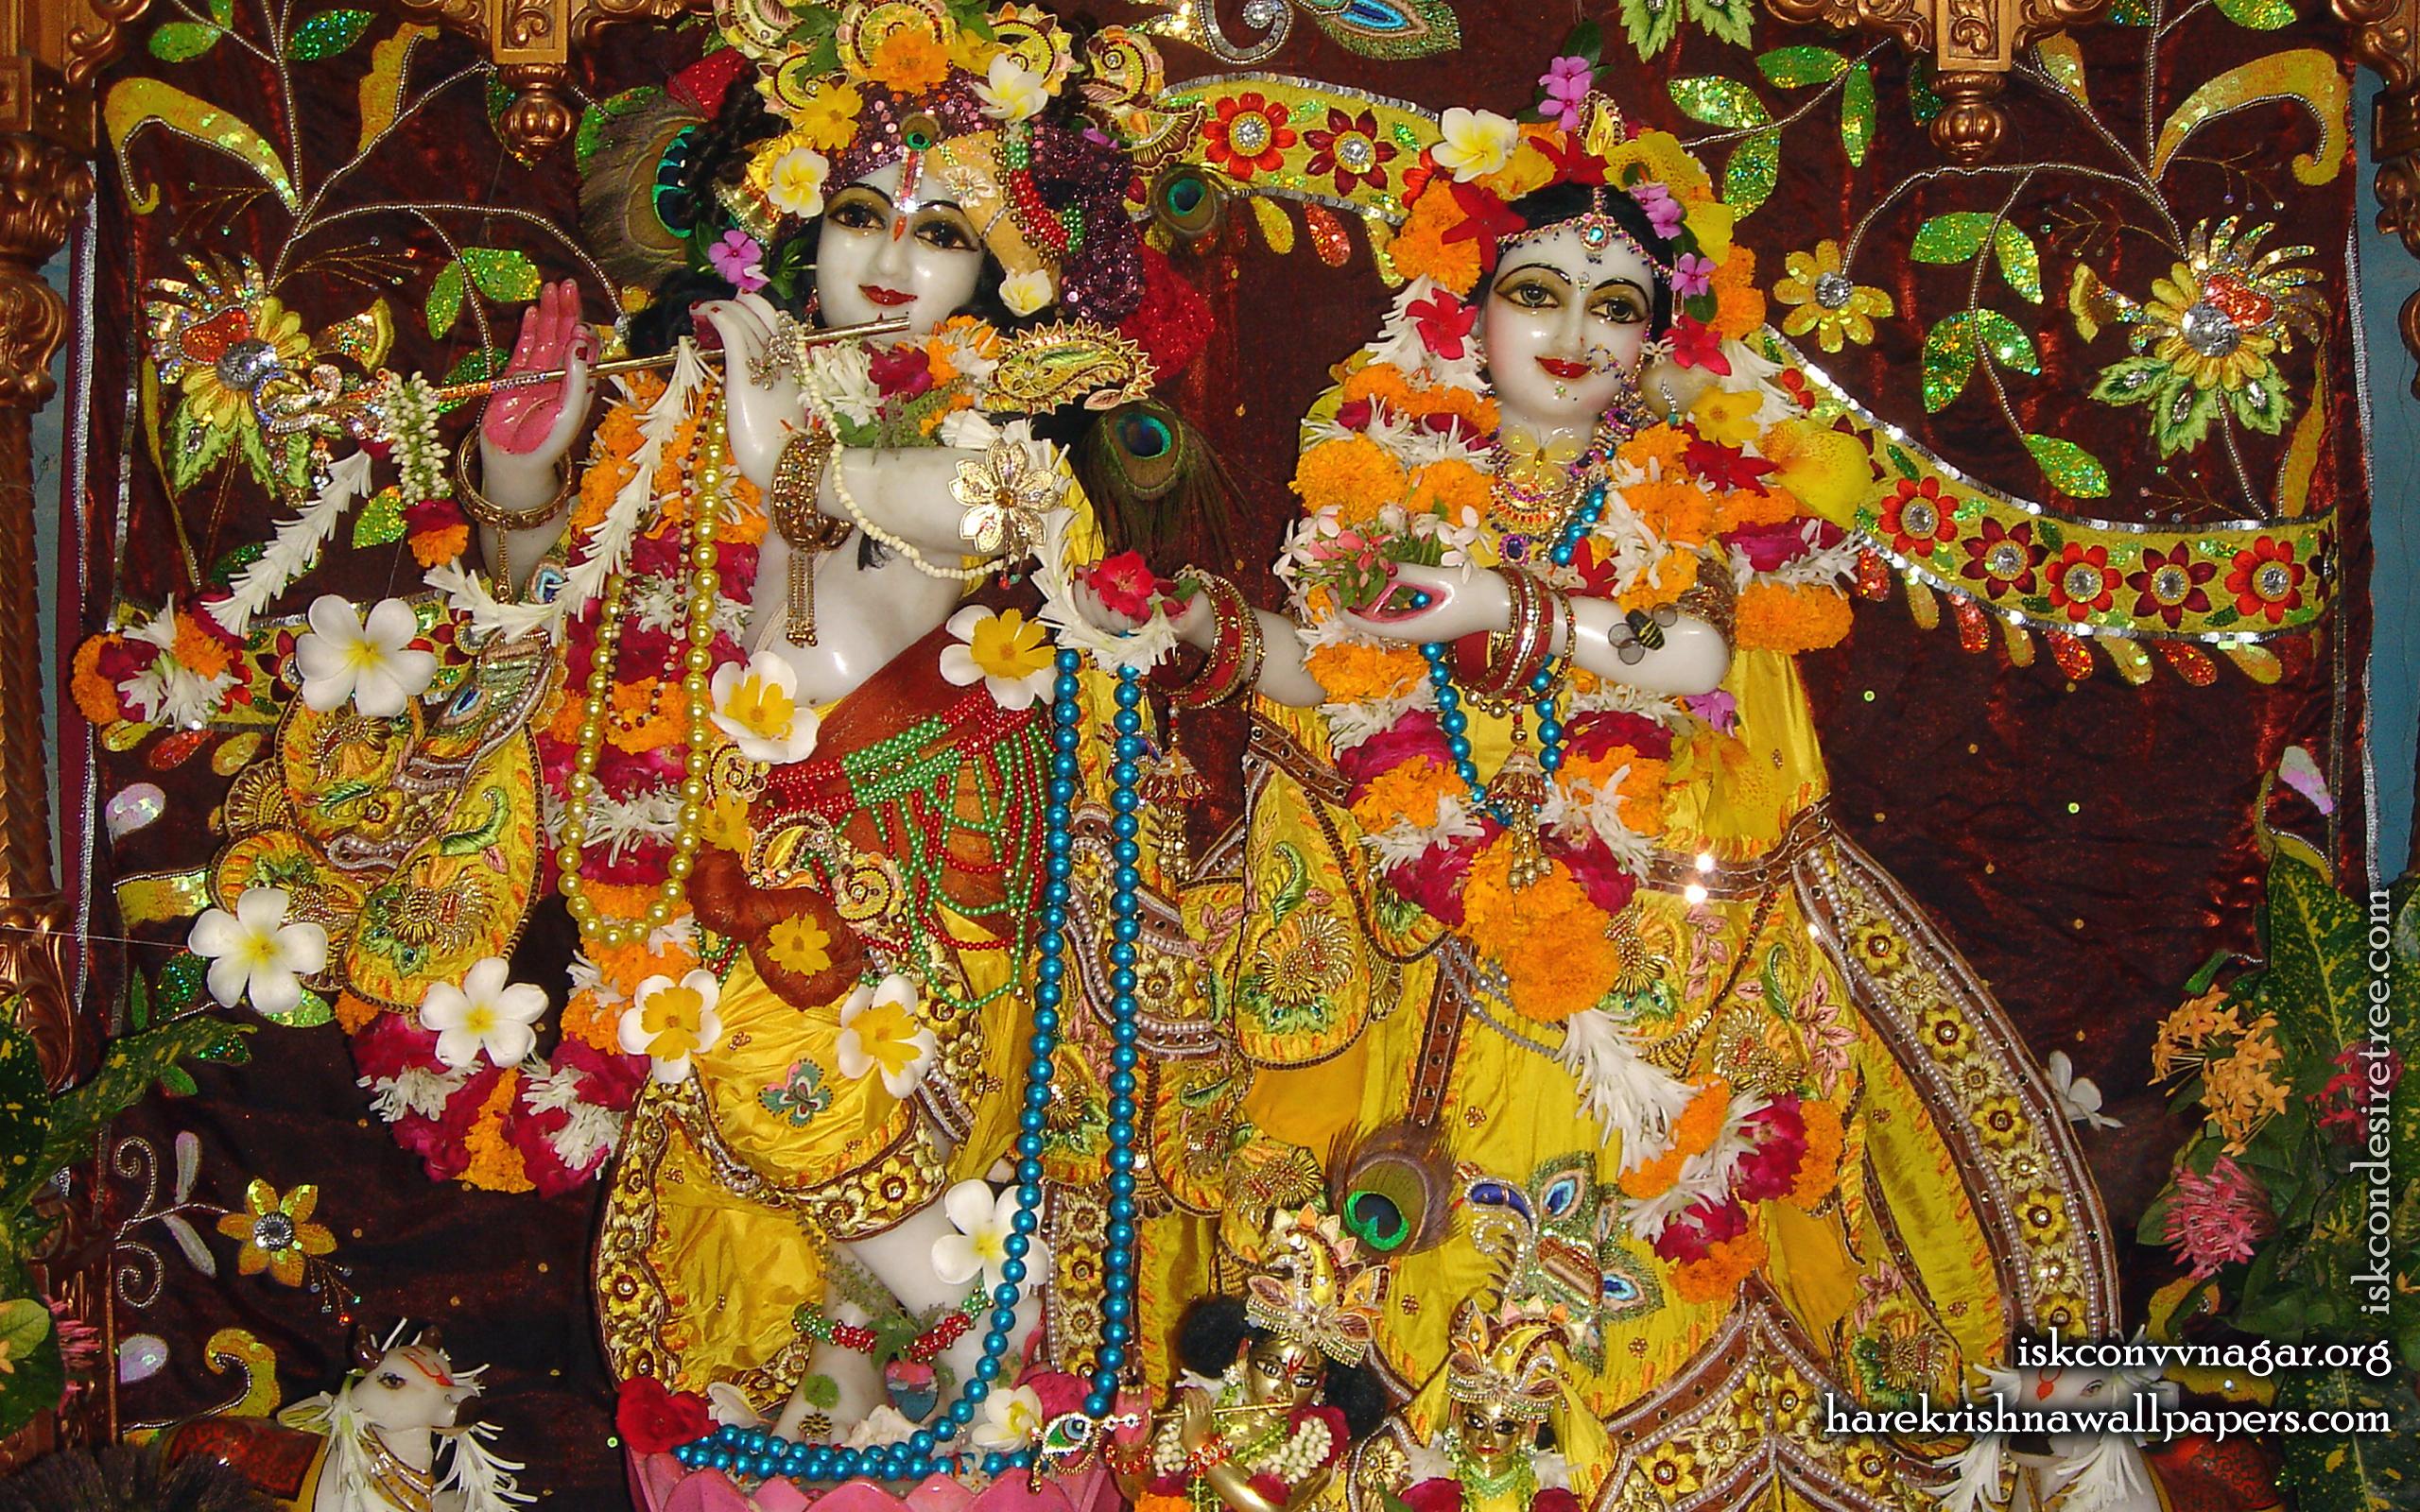 Sri Sri Radha Giridhari Wallpaper (006) Size 2560x1600 Download